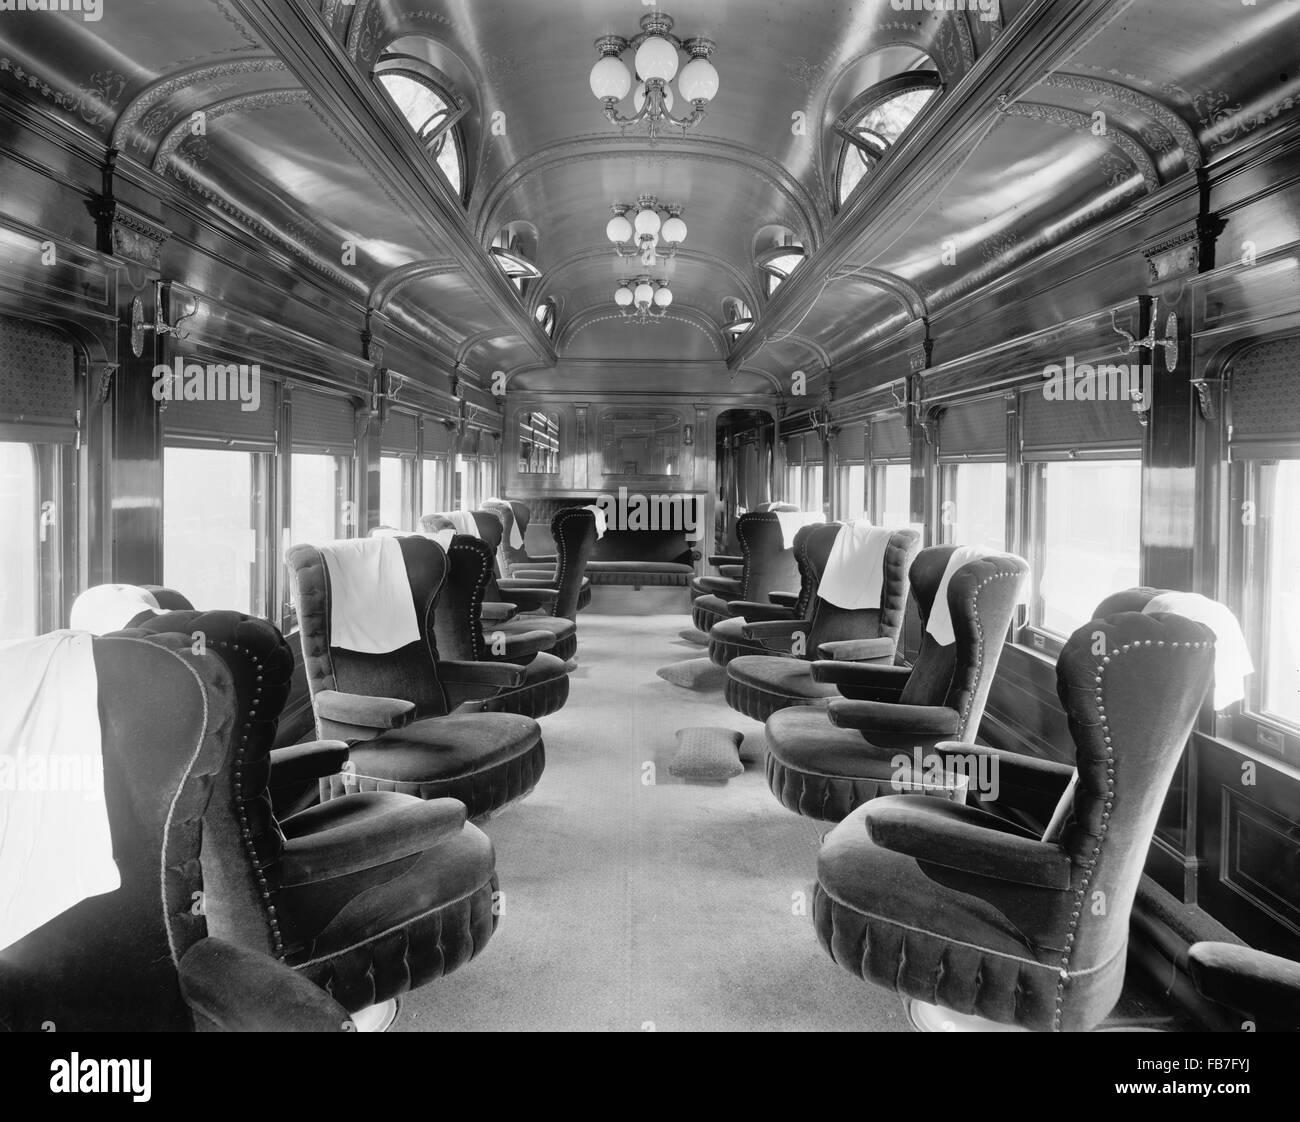 pere marquette railroad parlor car no 25 interior view usa 1910 stock photo 92979254 alamy. Black Bedroom Furniture Sets. Home Design Ideas